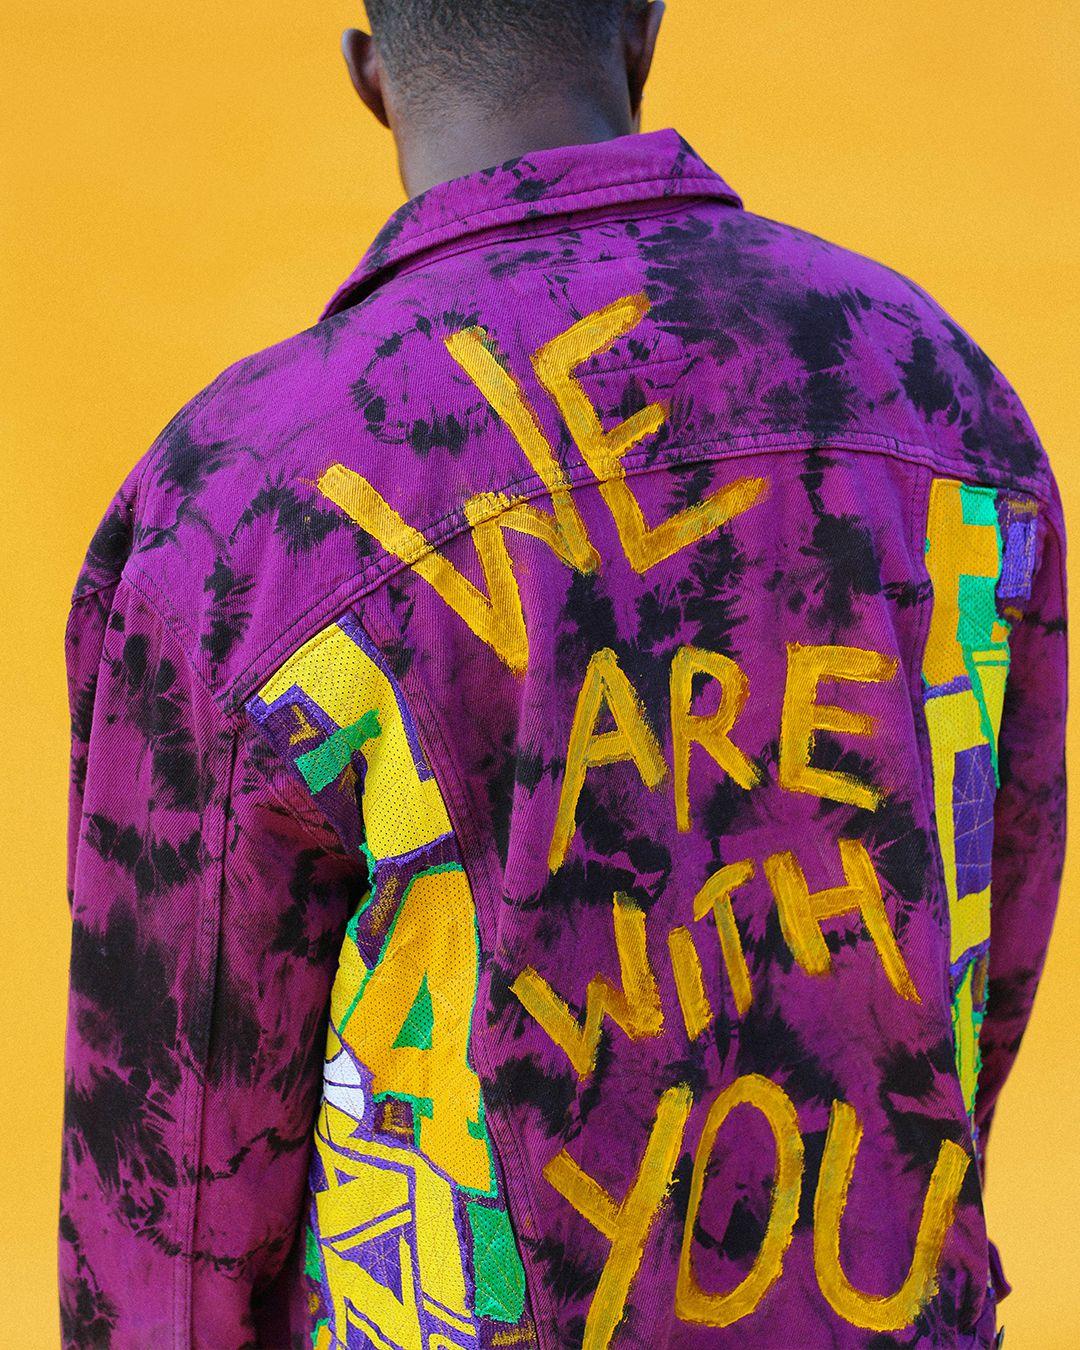 A jacket design from Lorne Sleem.